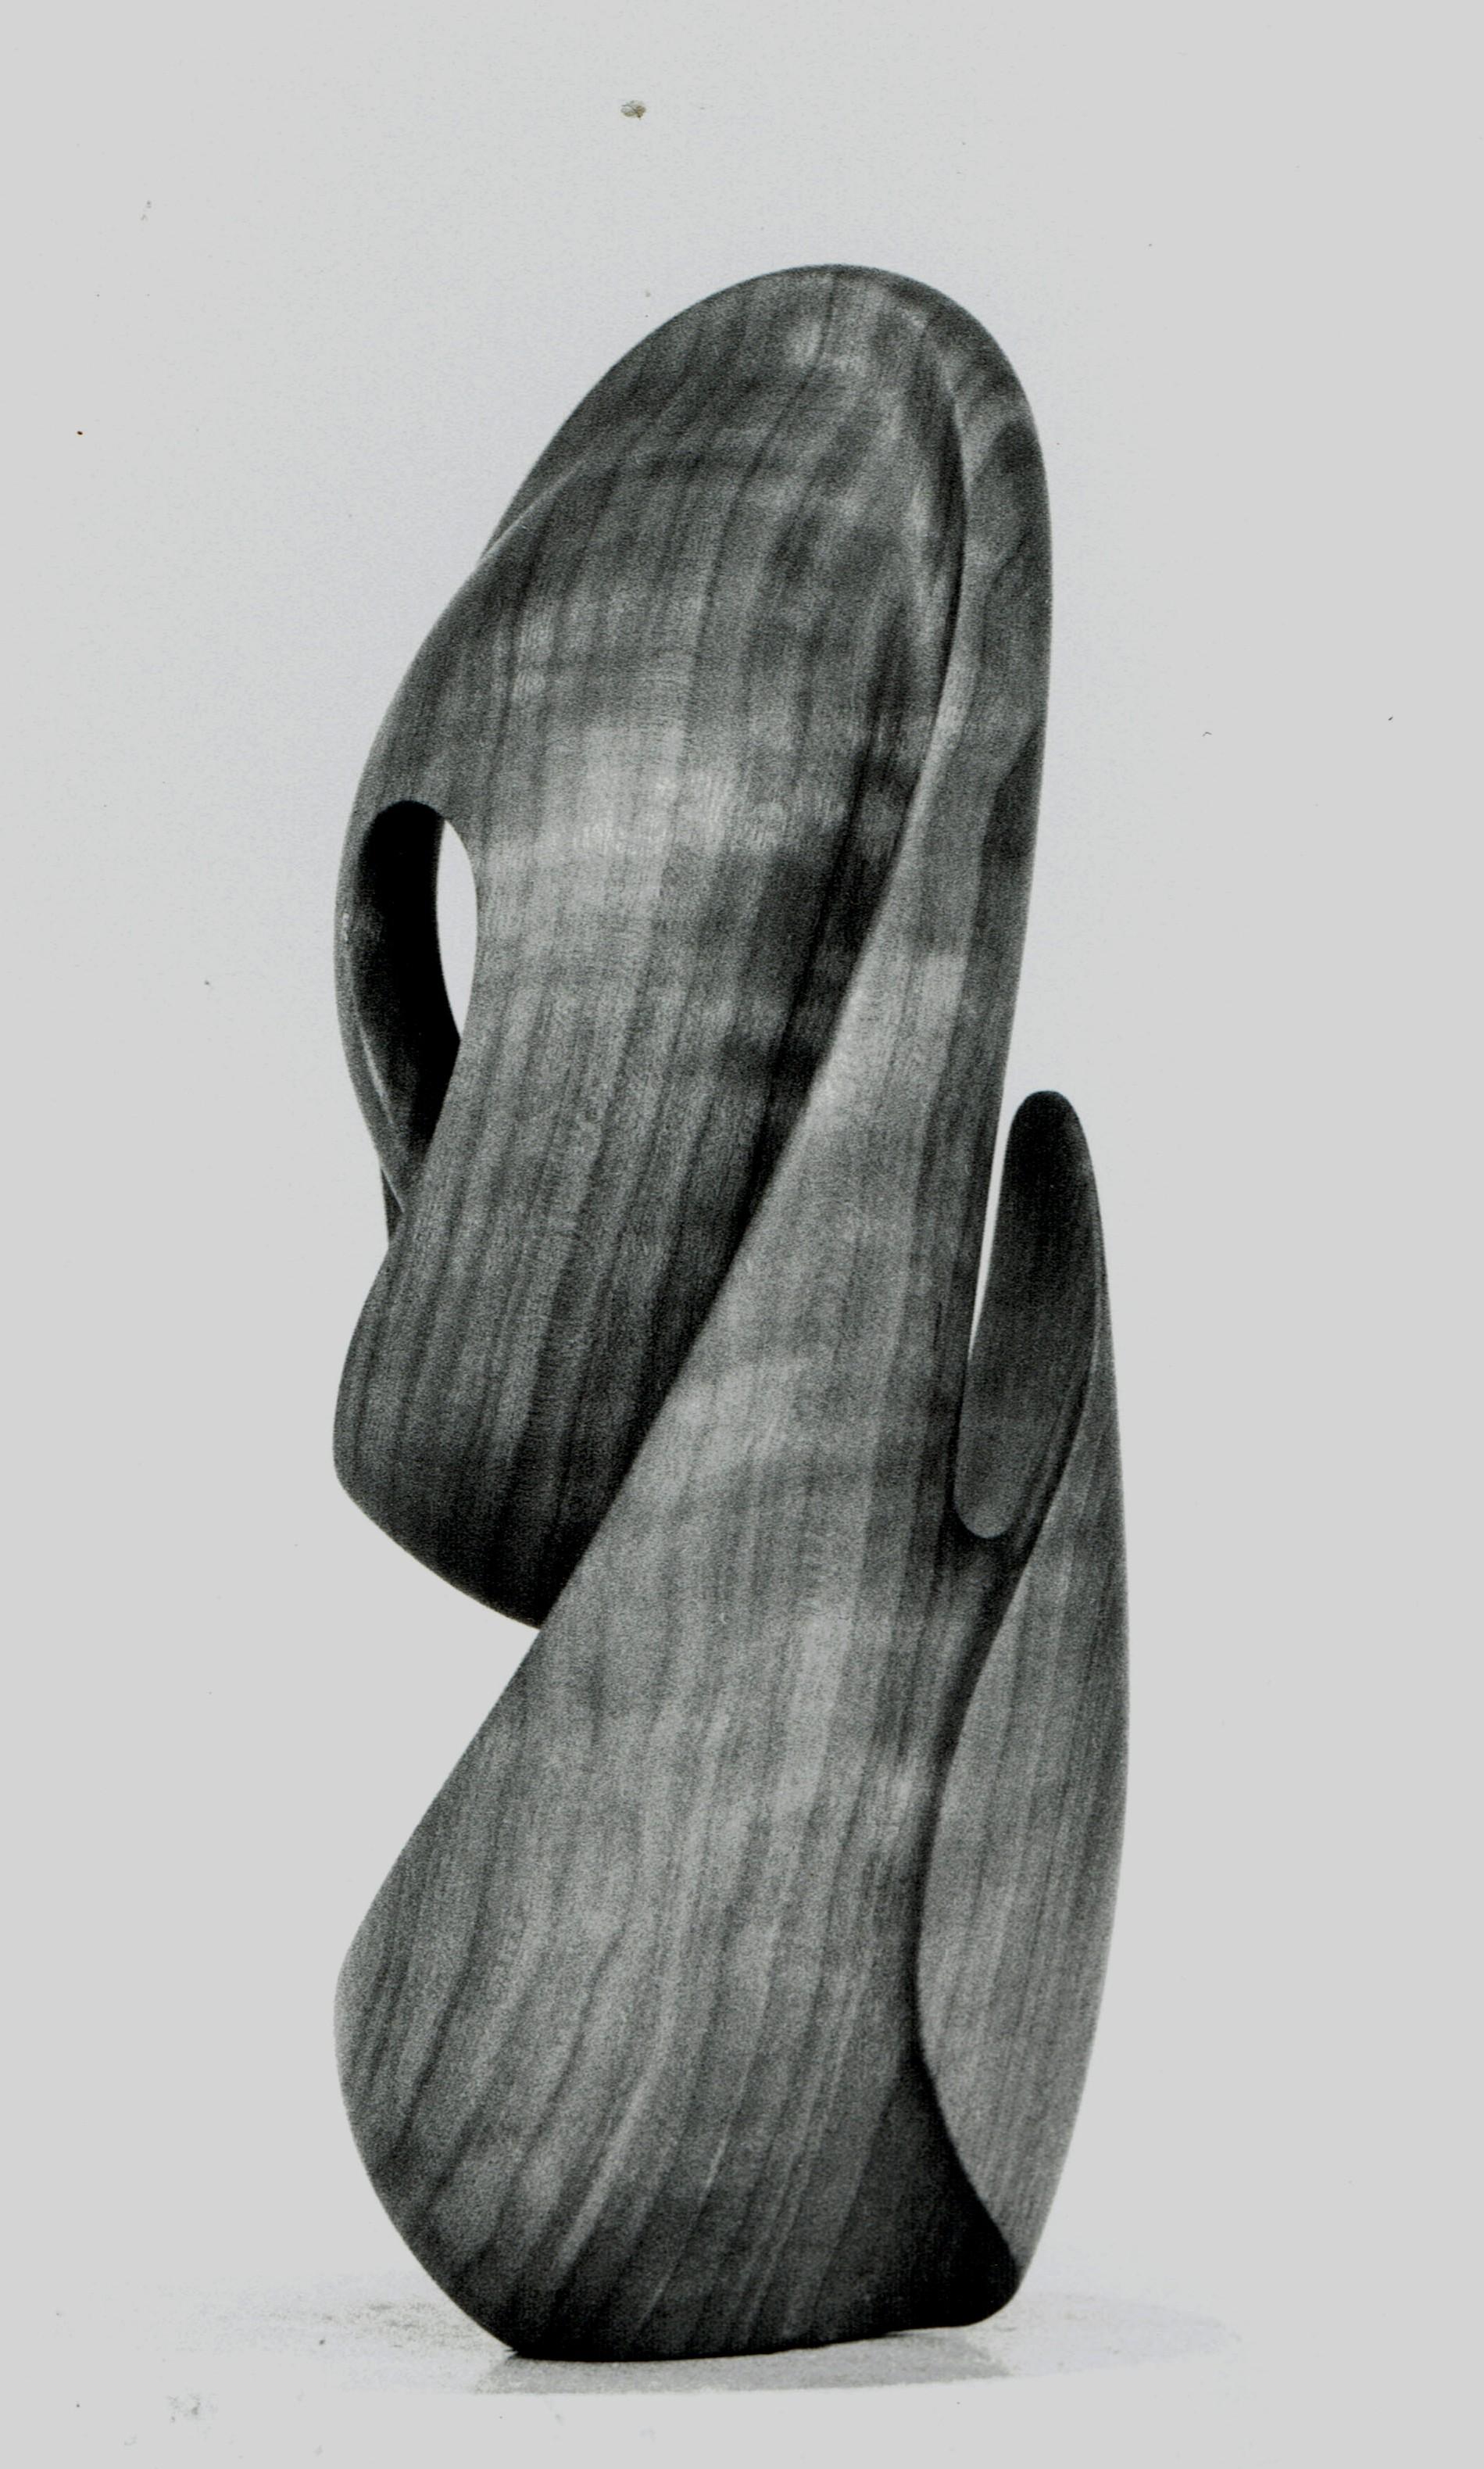 Skull (3rd view)